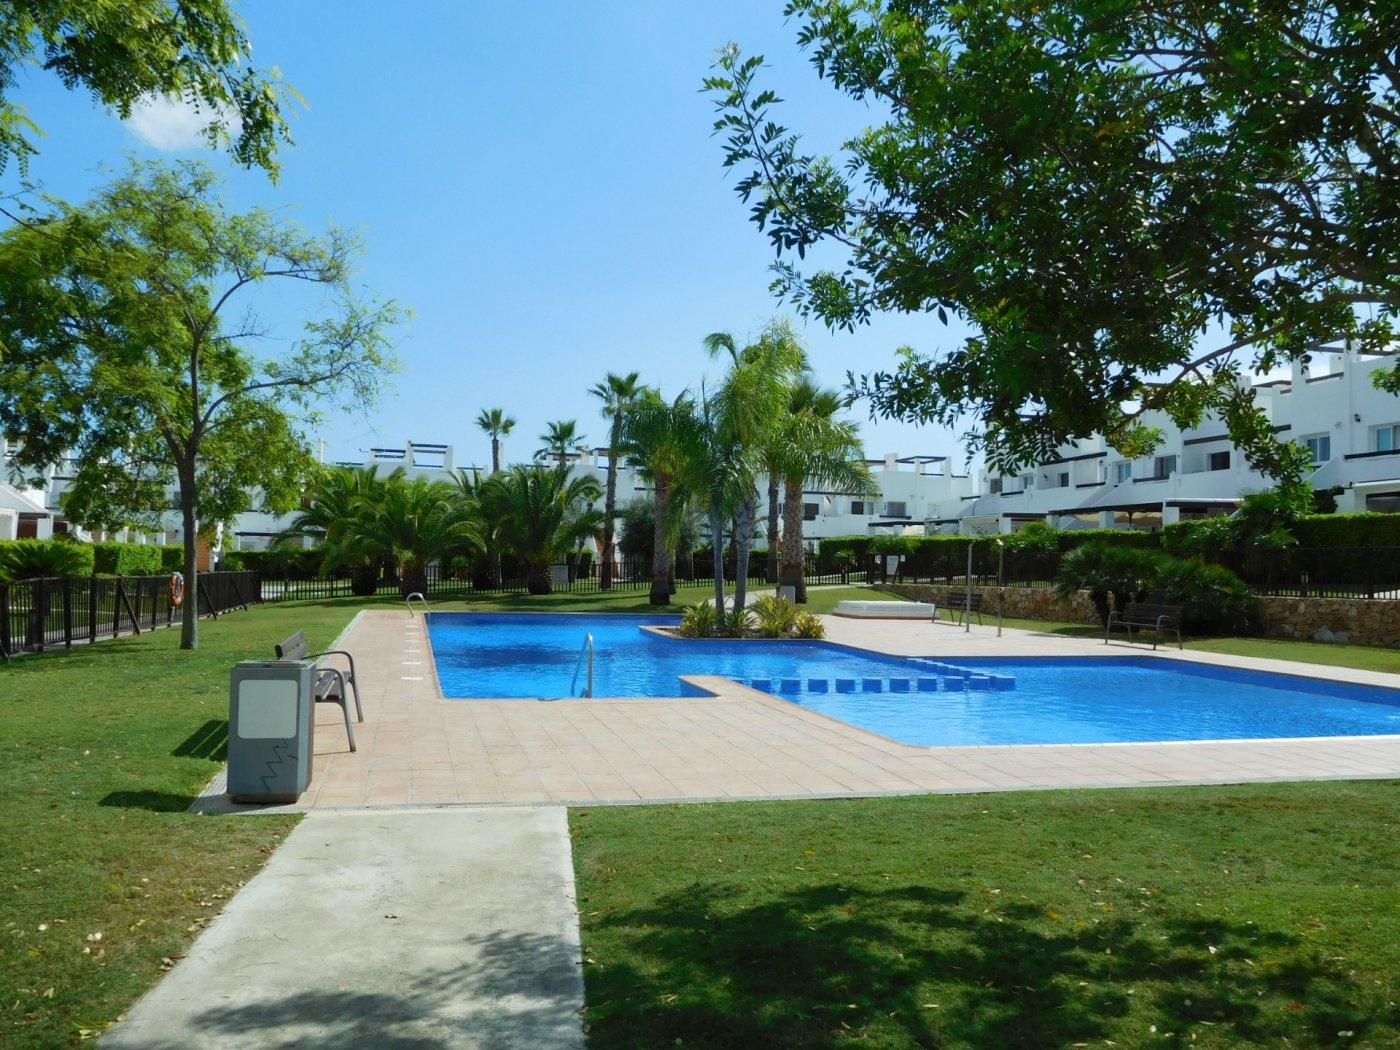 Gallery Image 28 of Apartment For rent in Condado De Alhama, Alhama De Murcia With Pool